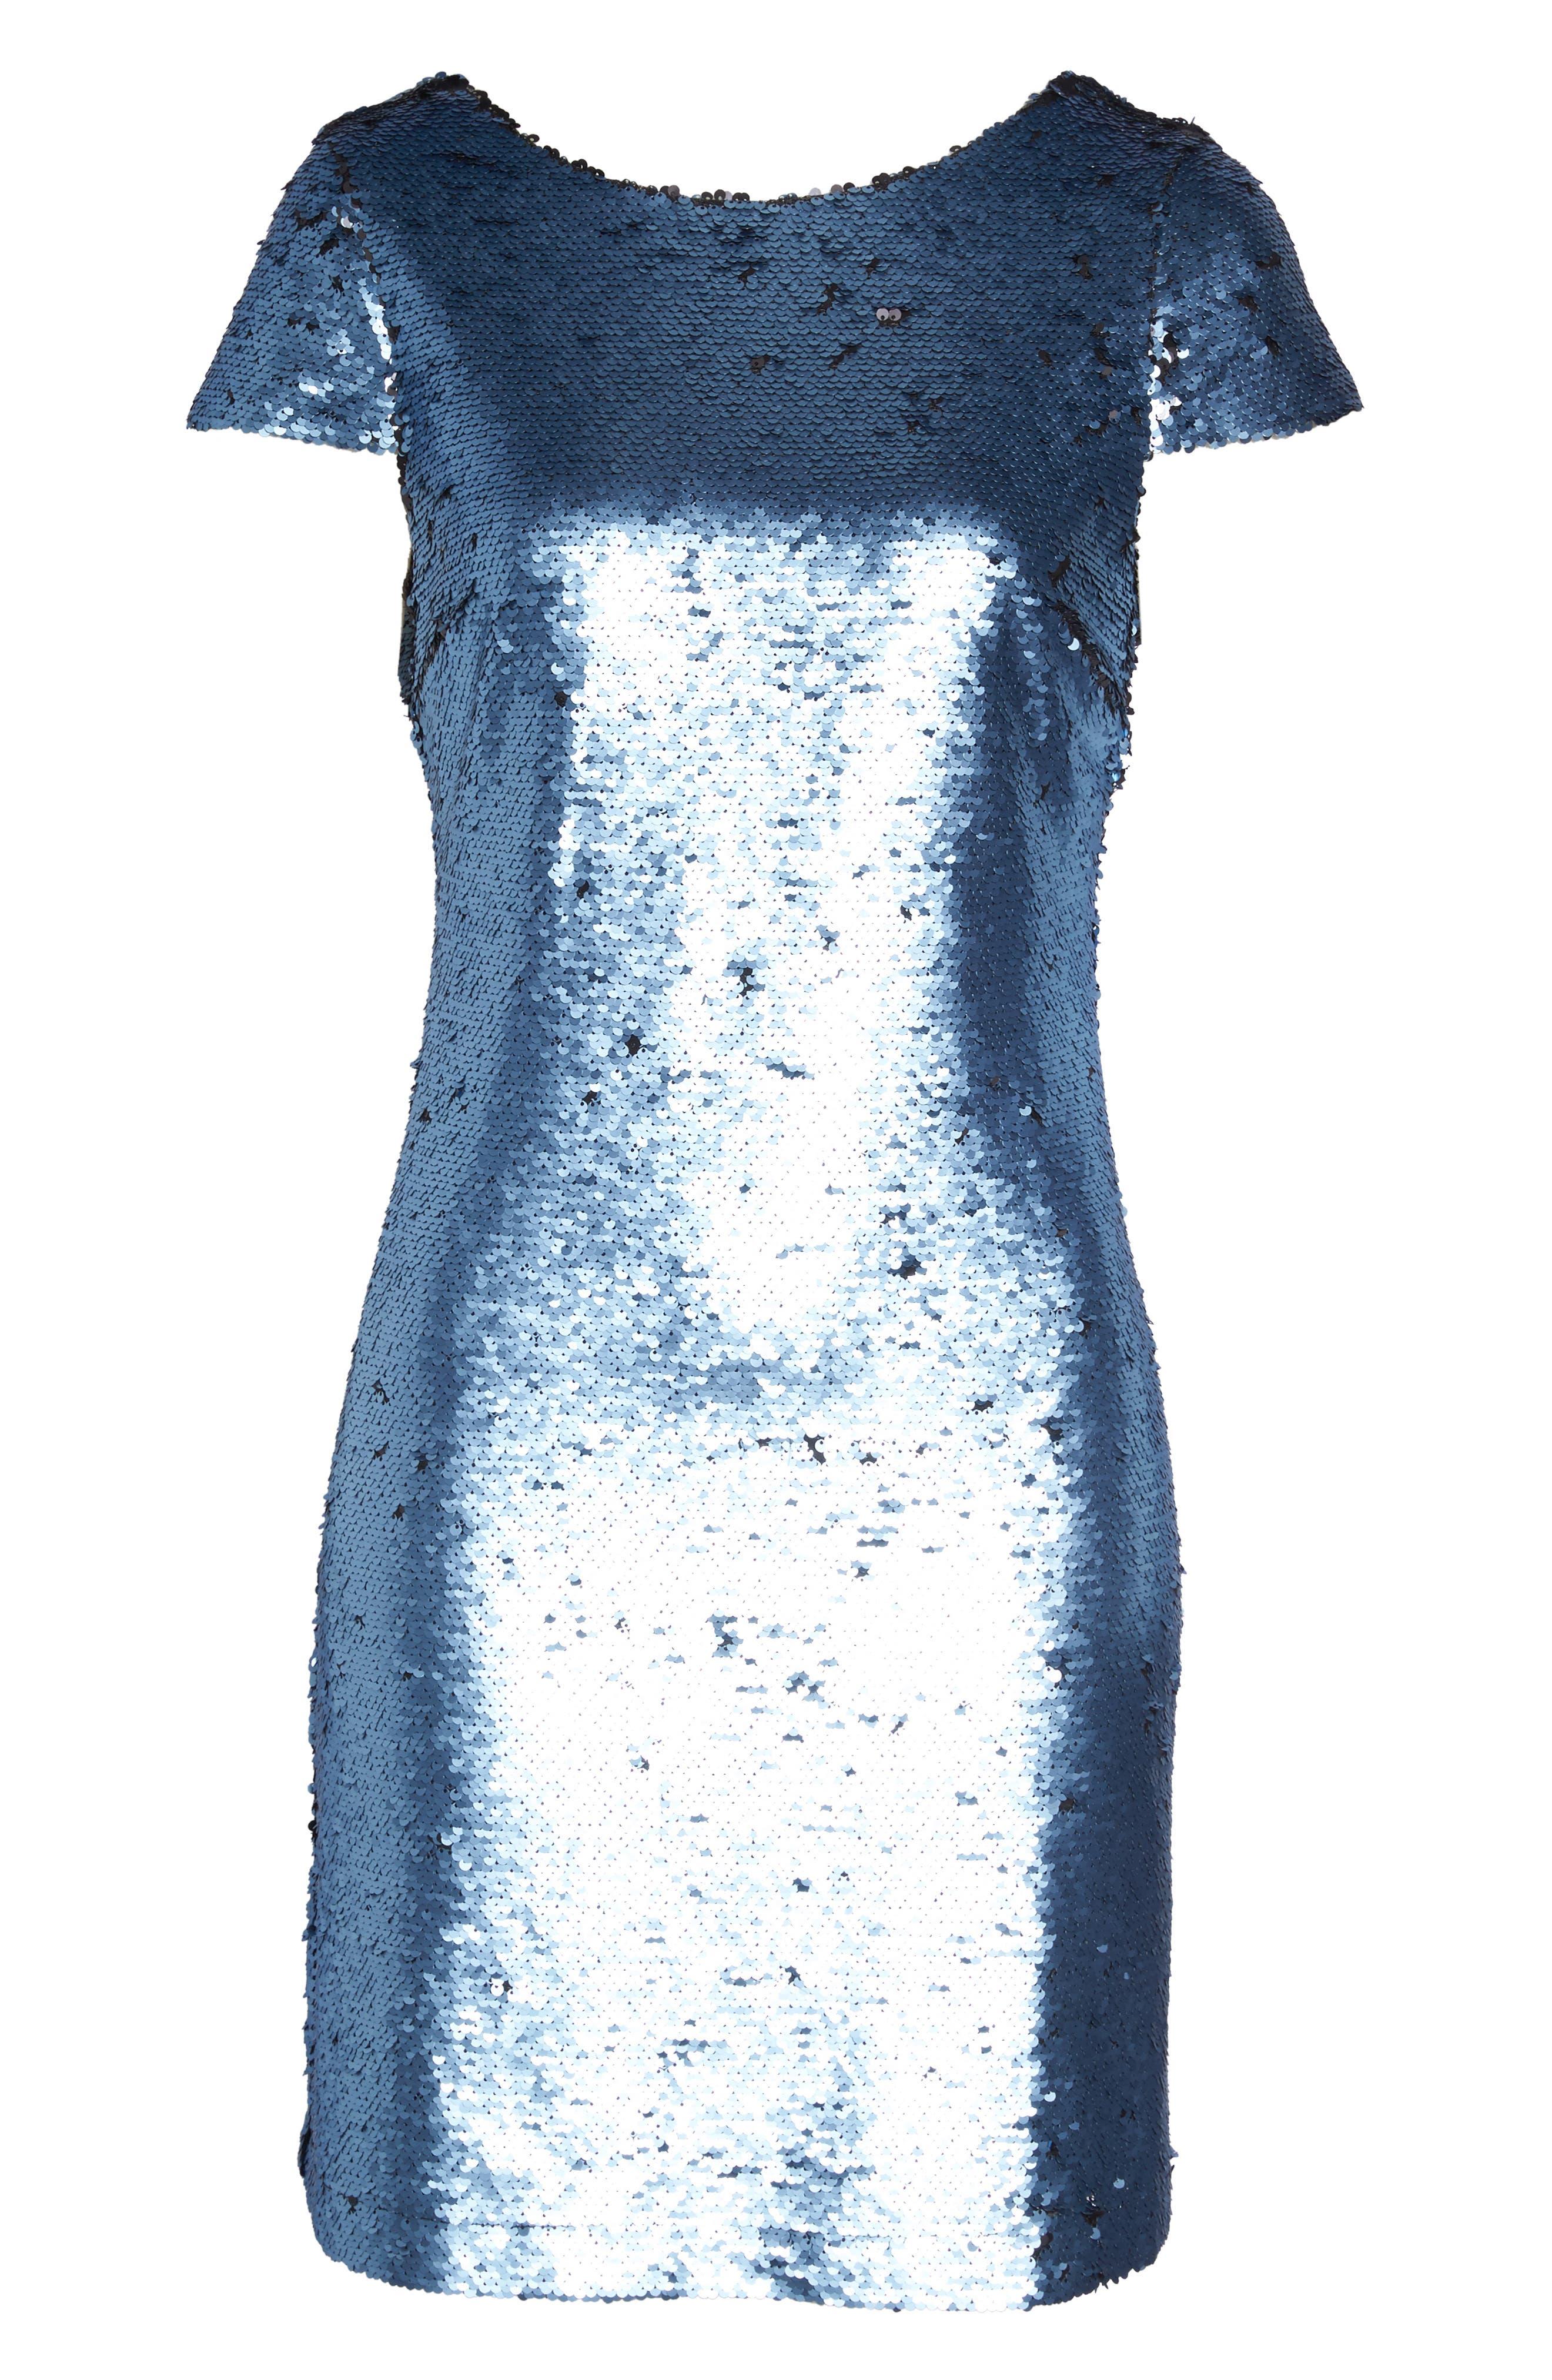 Sequin Sheath Dress,                             Alternate thumbnail 6, color,                             Blue